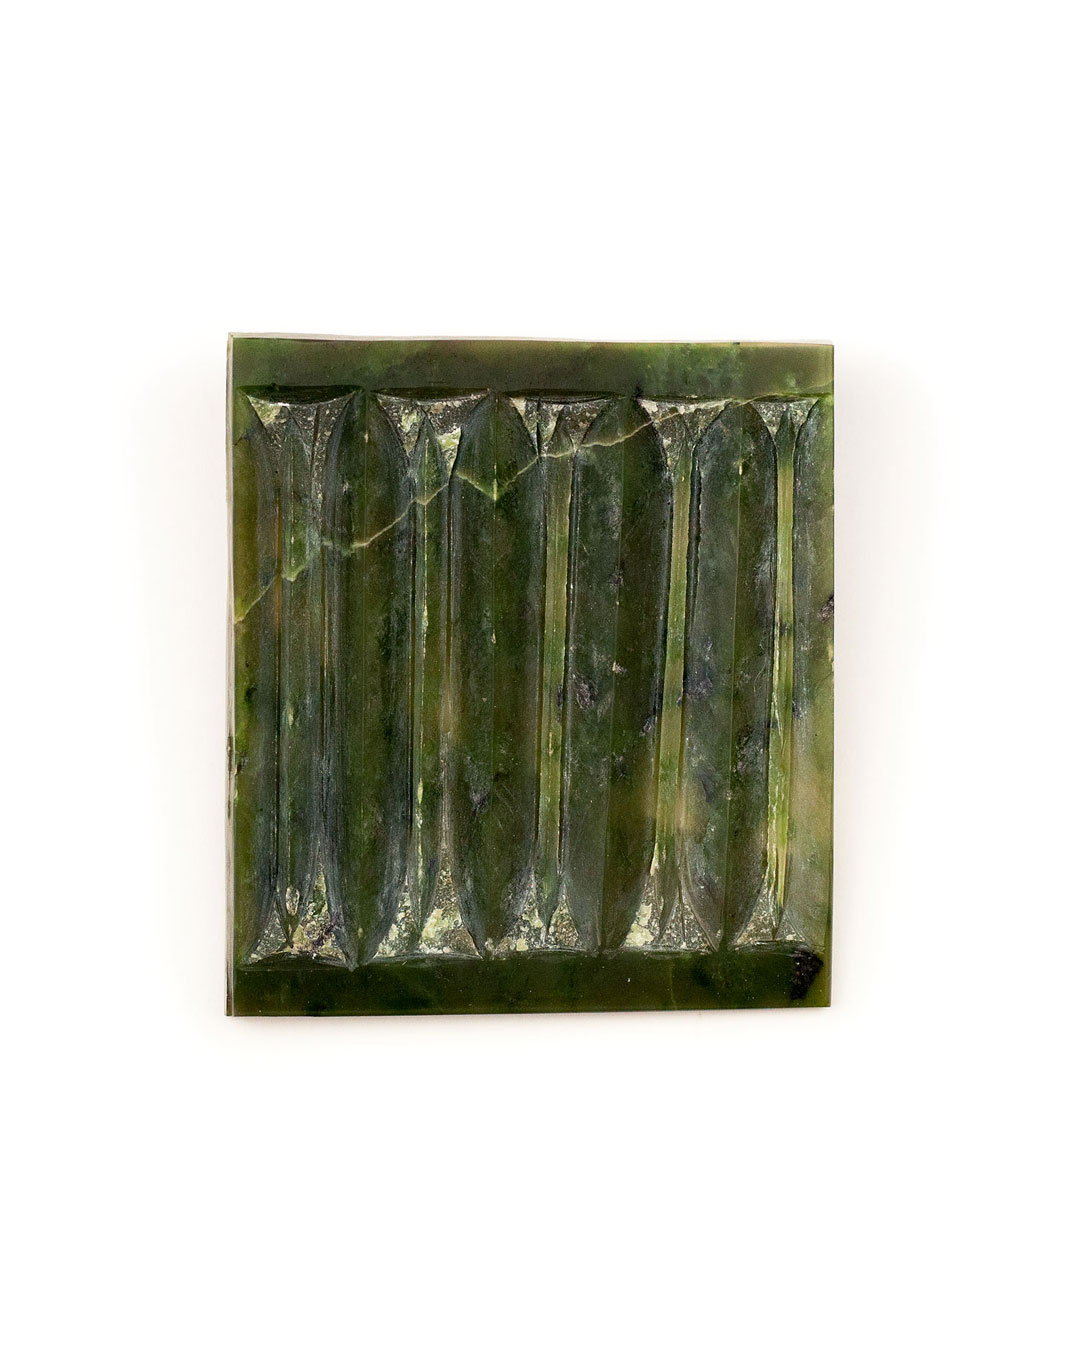 Pavel Opočenský, untitled, 2000, brooch; nefrite, 75 x 62 x 18 mm, €1265